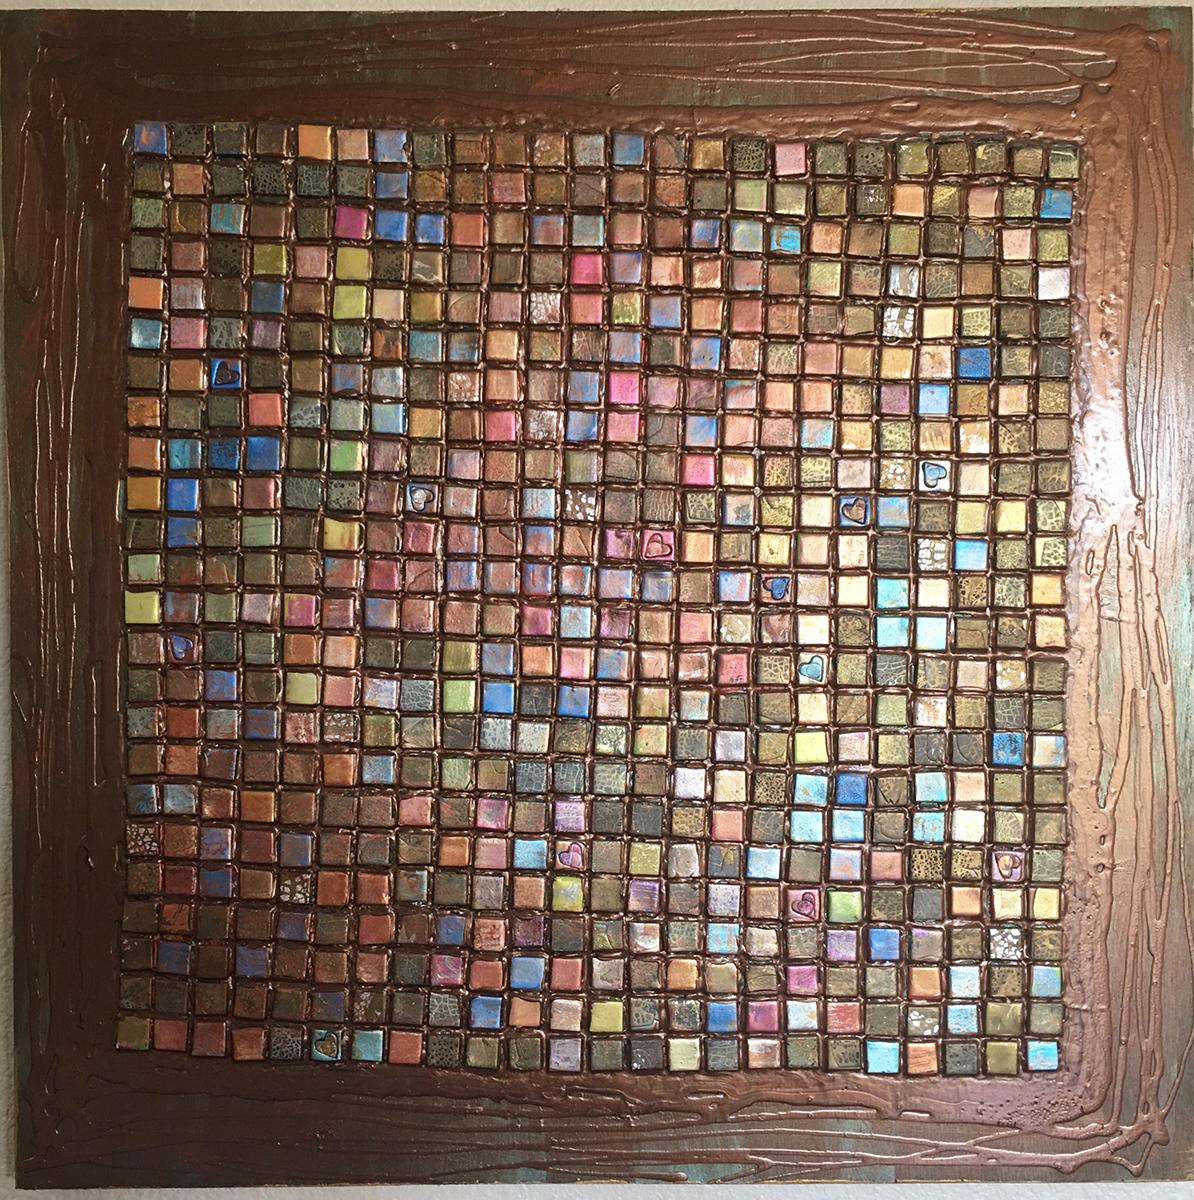 Tile Piece 1, Mixed Media, circa 1995, by Ann Stretton